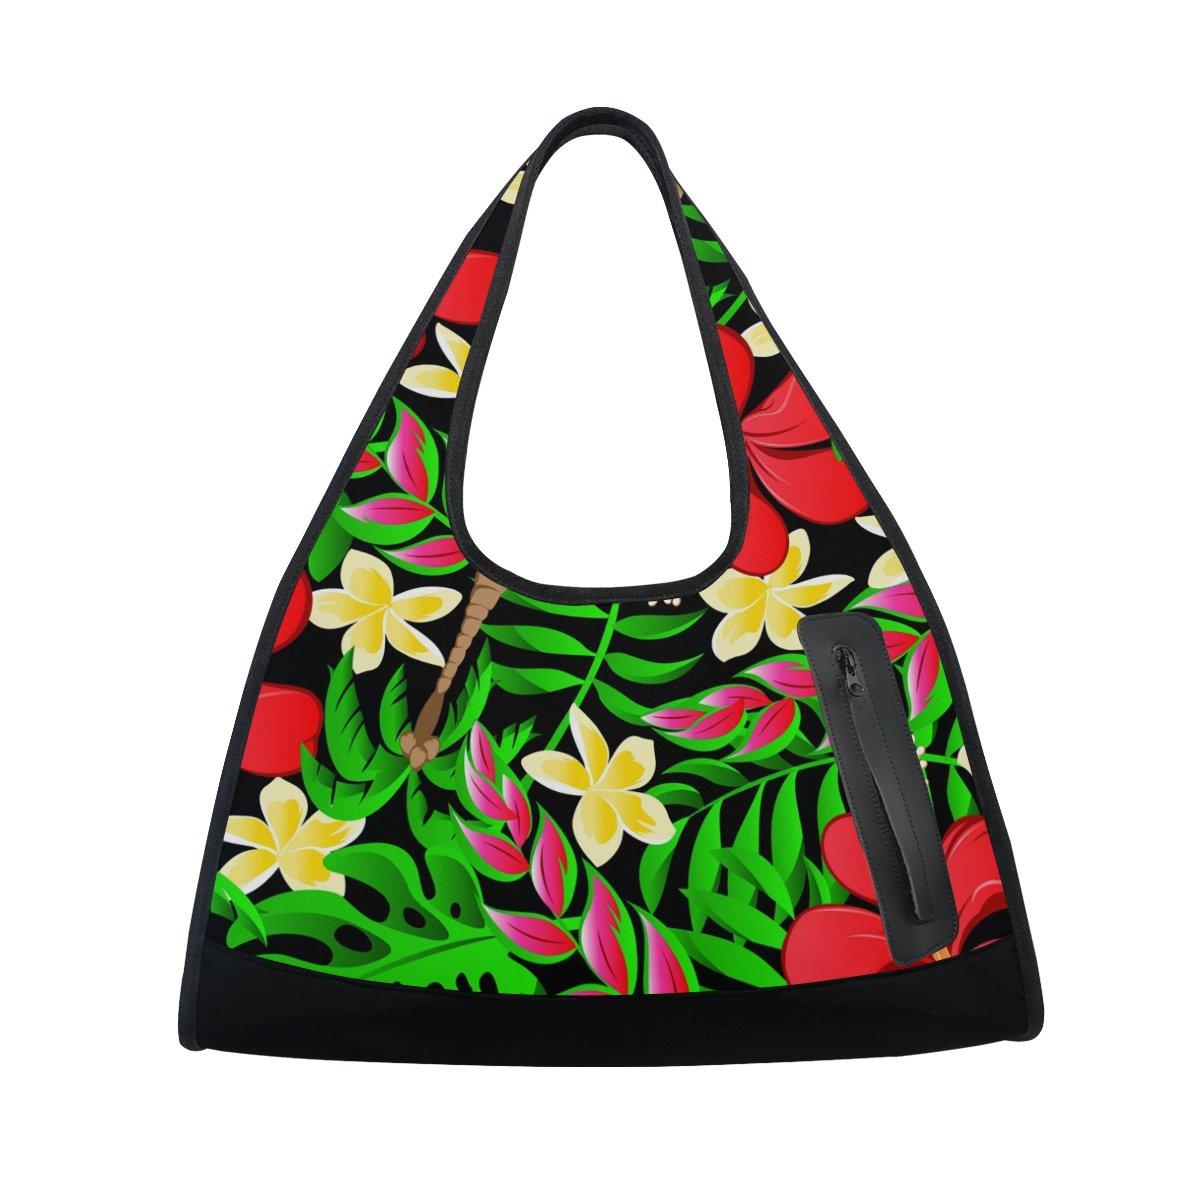 AHOMY Canvas Sports Gym Bag Tropical Palm Tree Leaf Abstract Travel Shoulder Bag